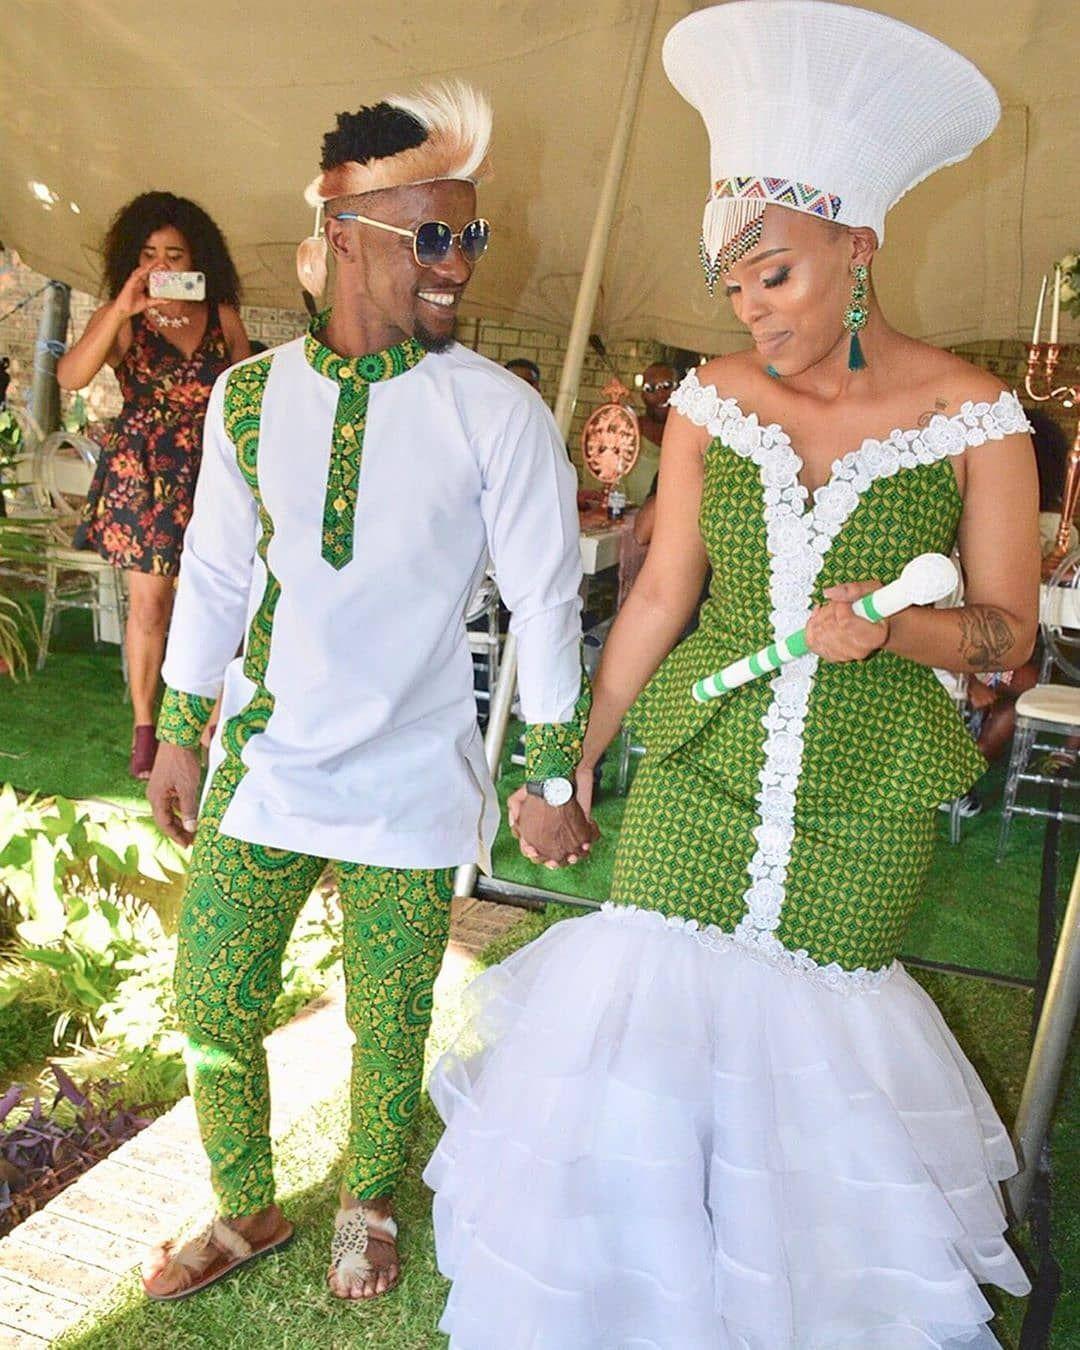 Sepedi Traditional Dresses Wedding We All Love In 2020 African Traditional Wedding Dress Zulu Traditional Wedding Dresses South African Traditional Dresses